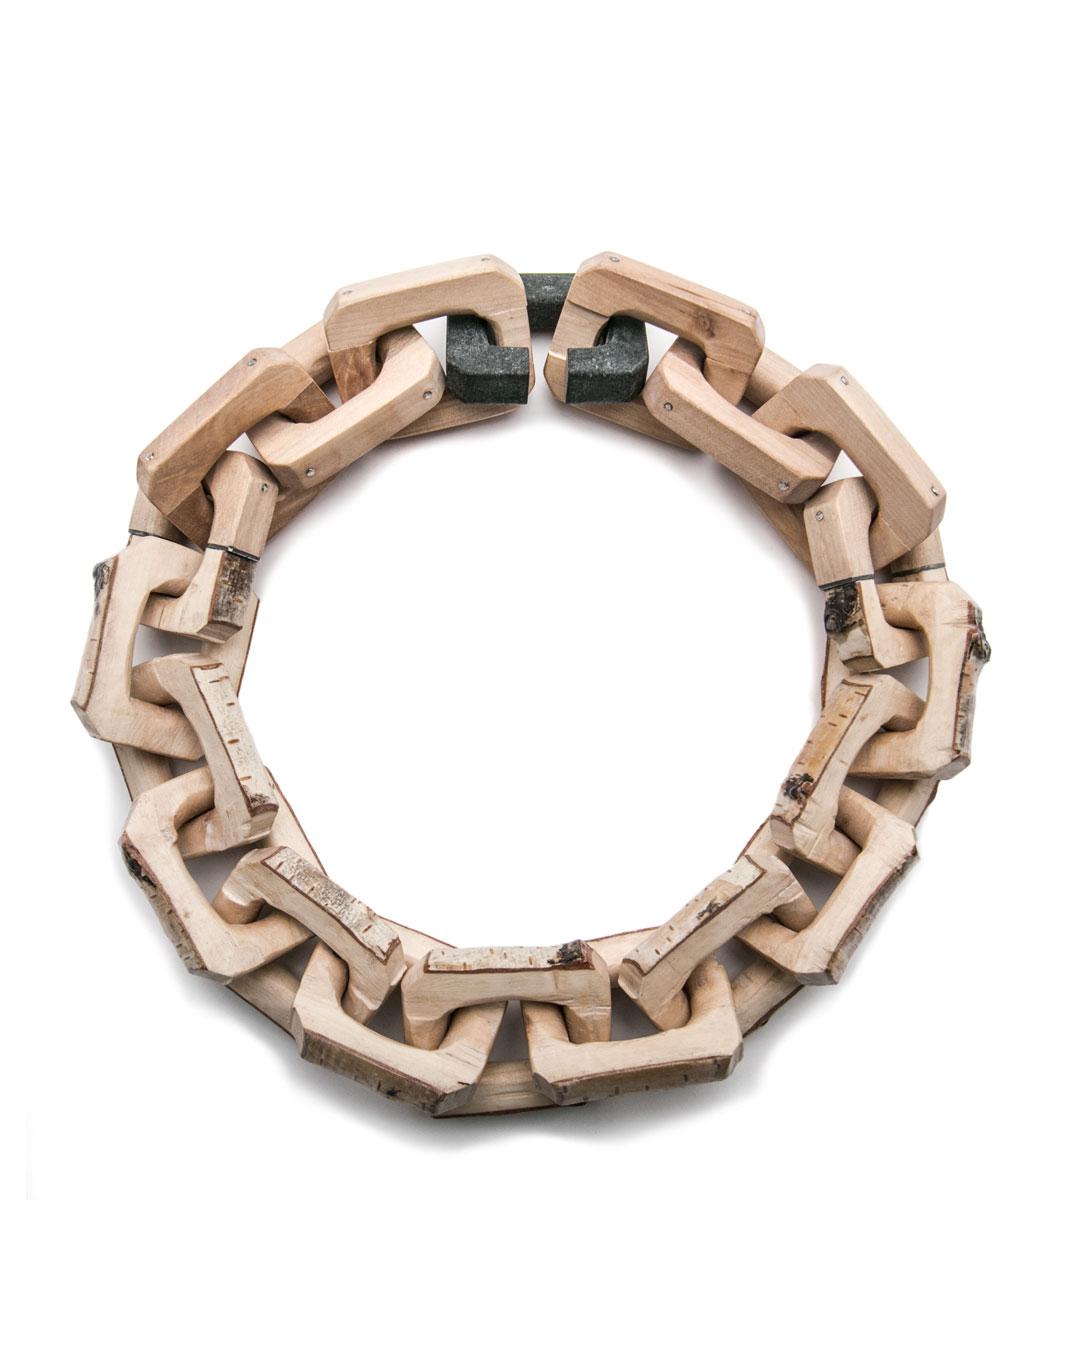 Marek Mrowinski, Attitudes, 2017, necklace; wood, diabase, silver, 230 x 230 x 43 mm, €1630